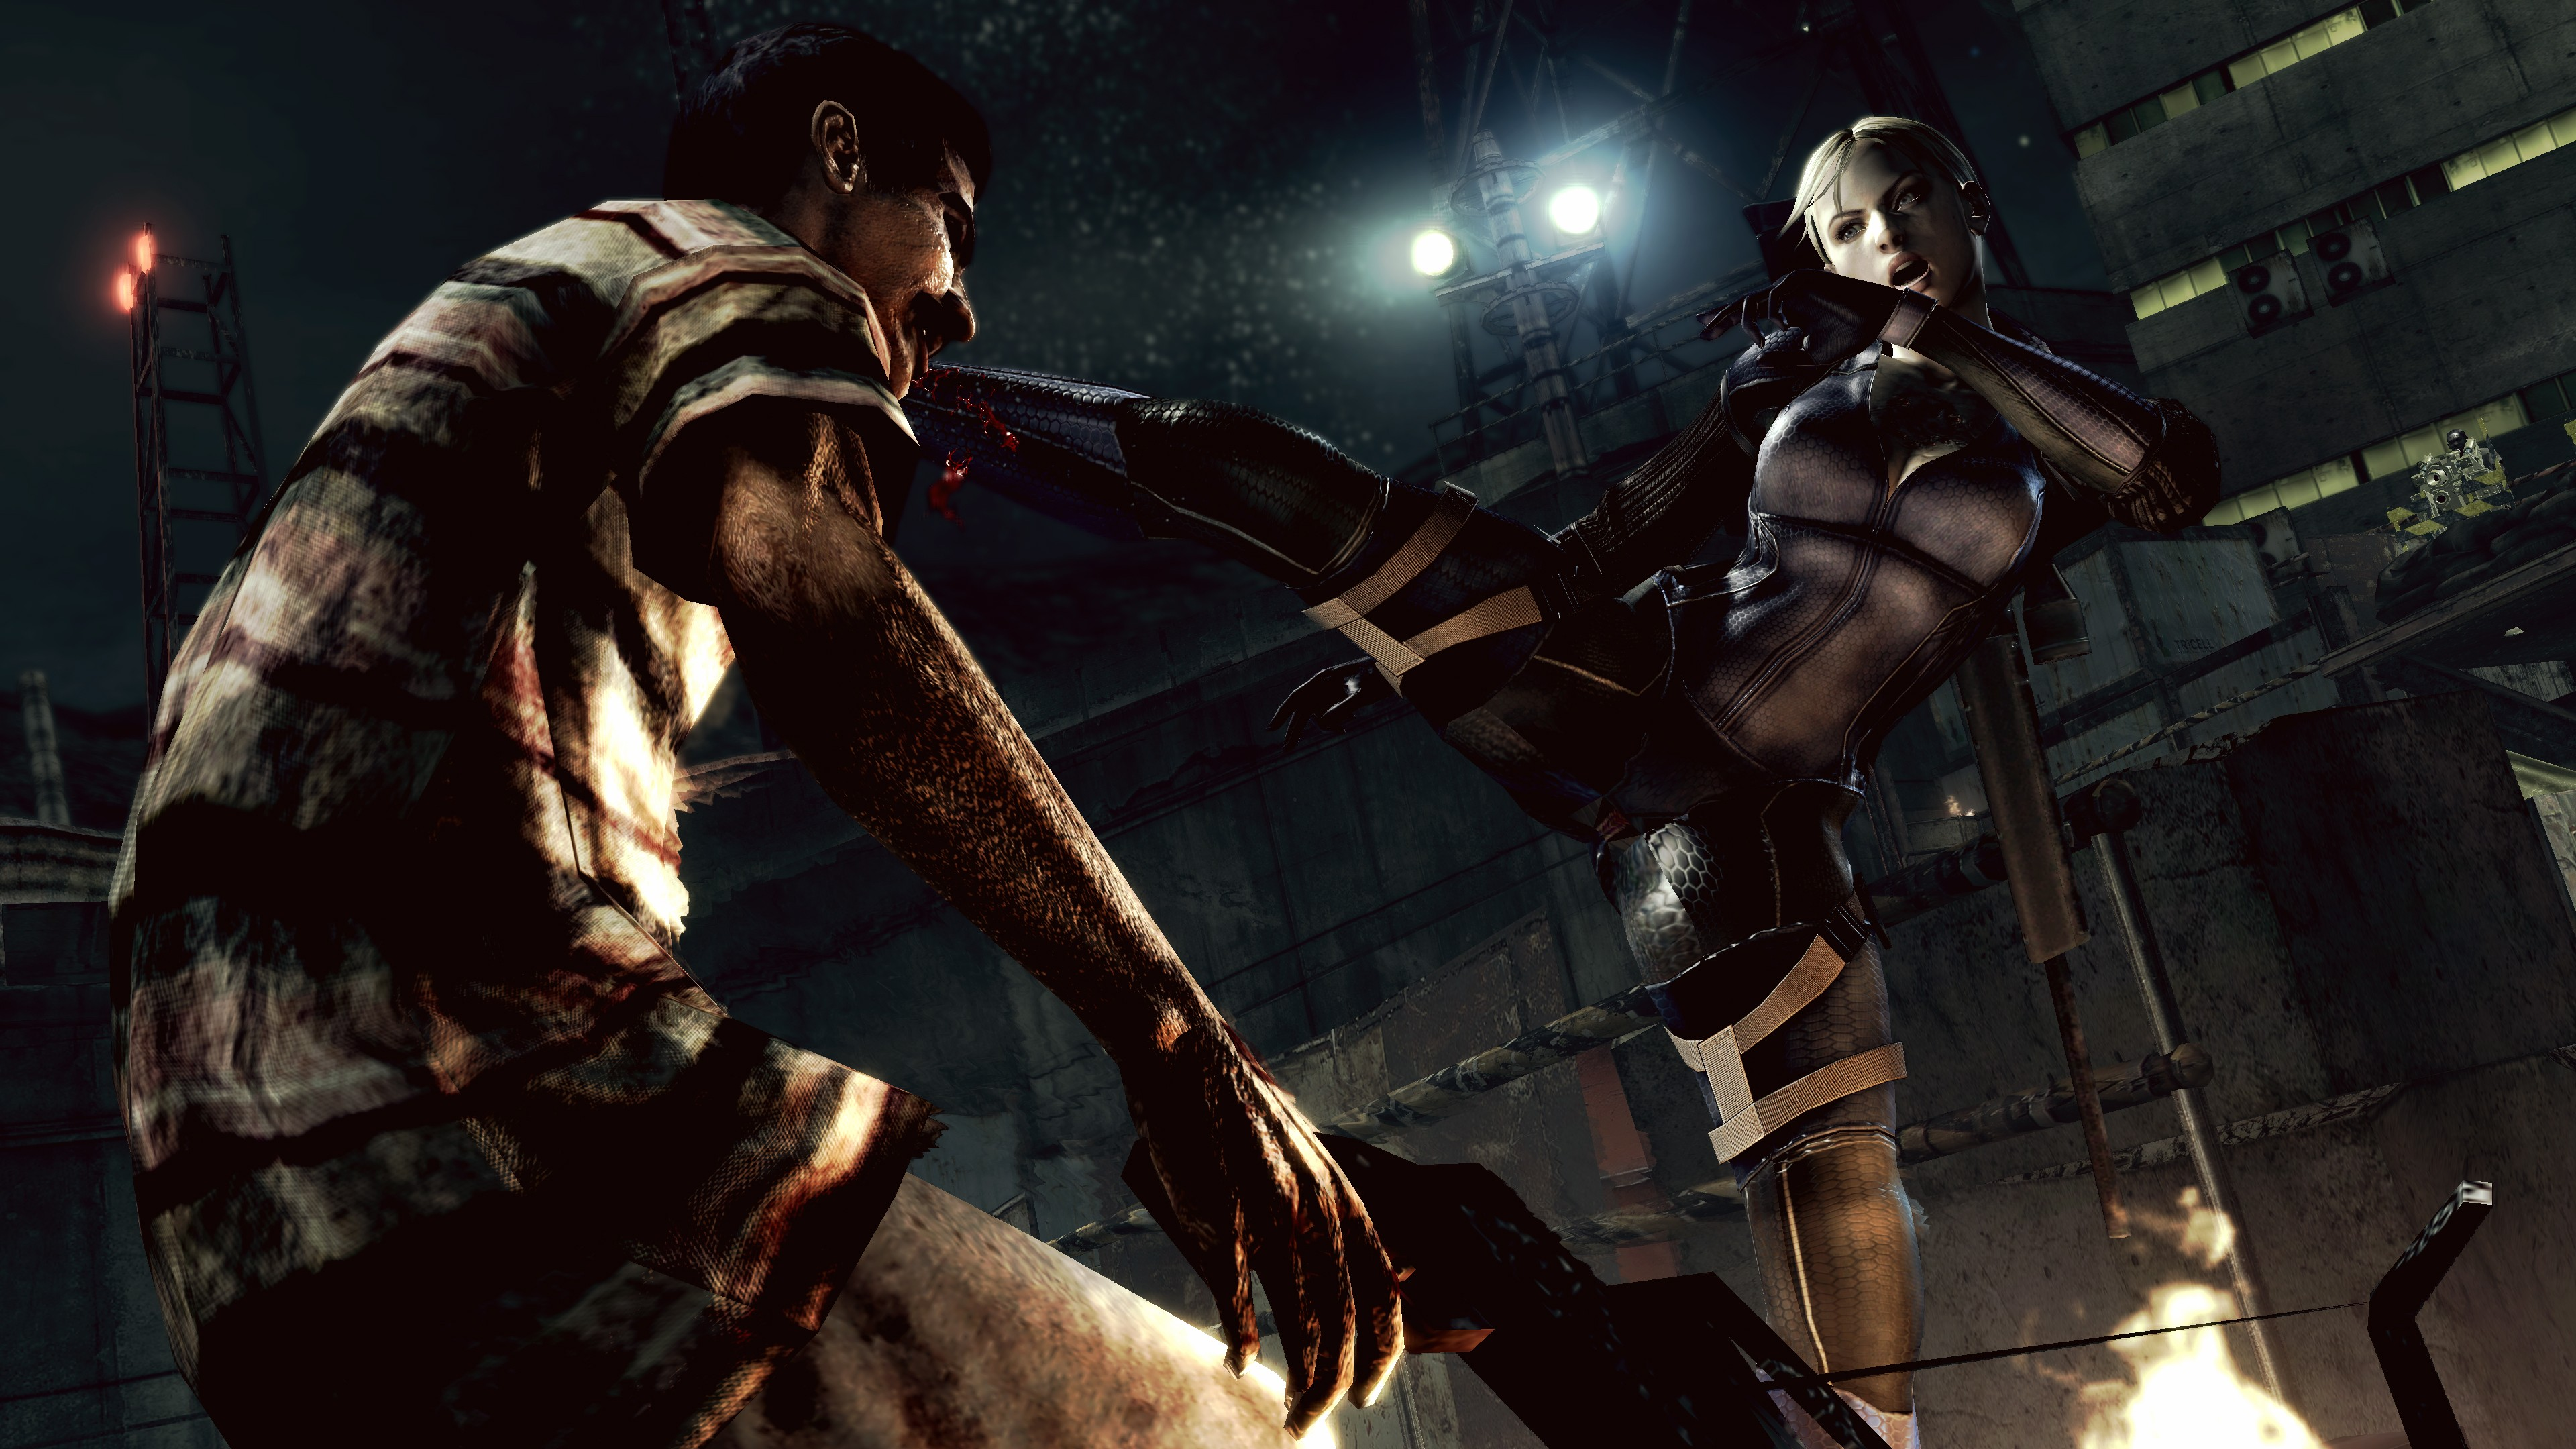 Resident Evil 5 4k Ultra HD Wallpaper | Background Image ...